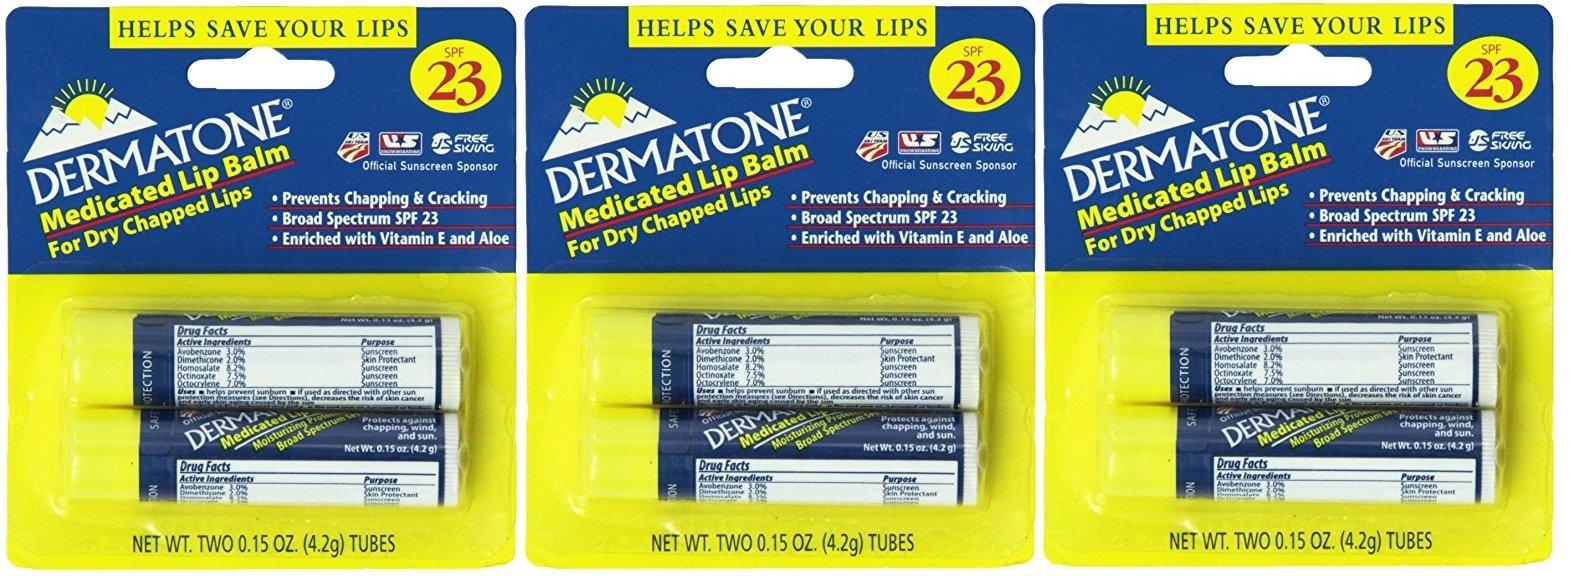 Dermatone Medicated Lip Balm SPF 23,0.15-Ounce, 6 Count by Dermatone